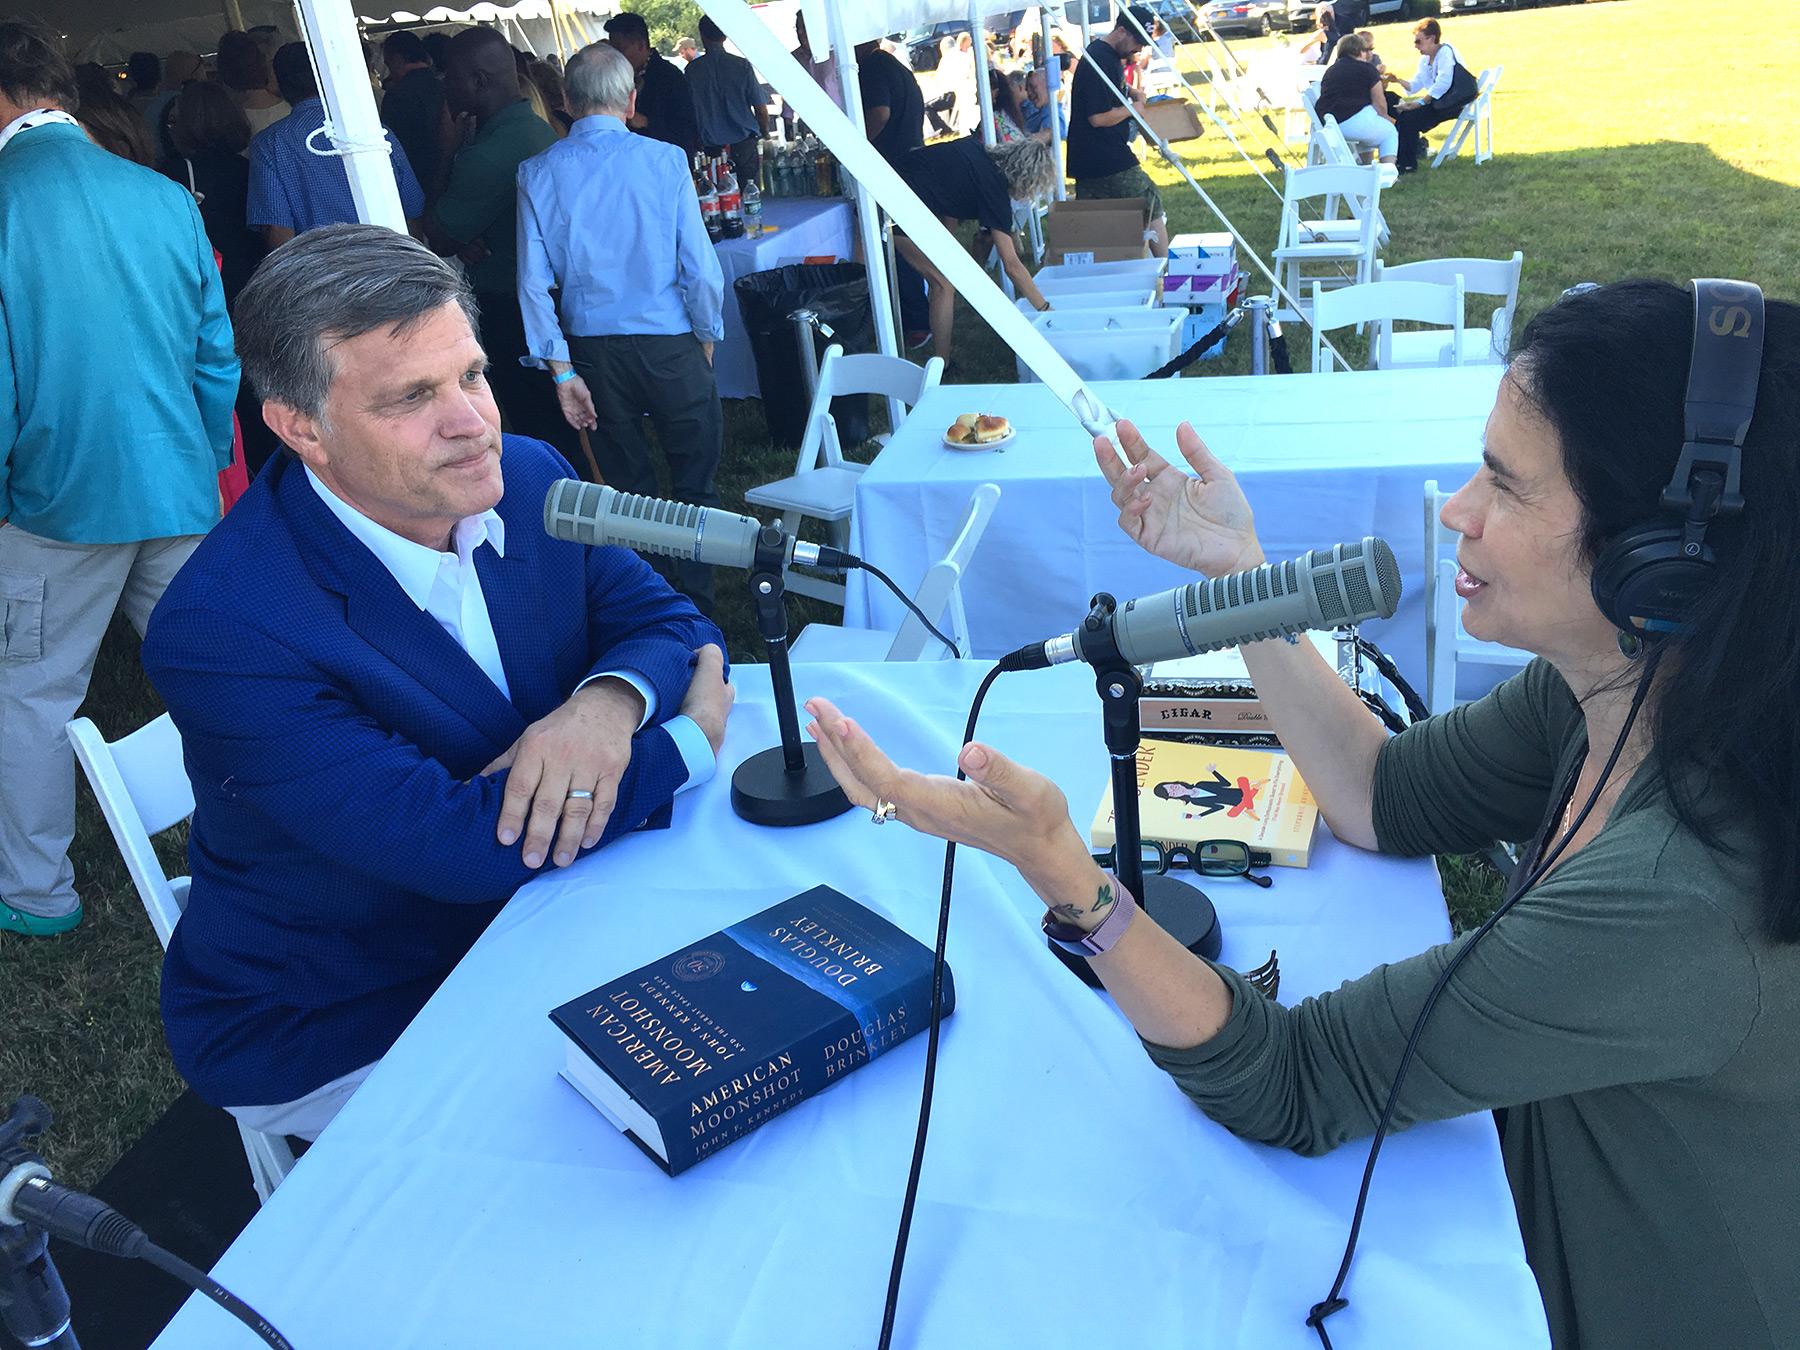 Interviewing Douglas Brinkley. Photo by Kelly Loeffler